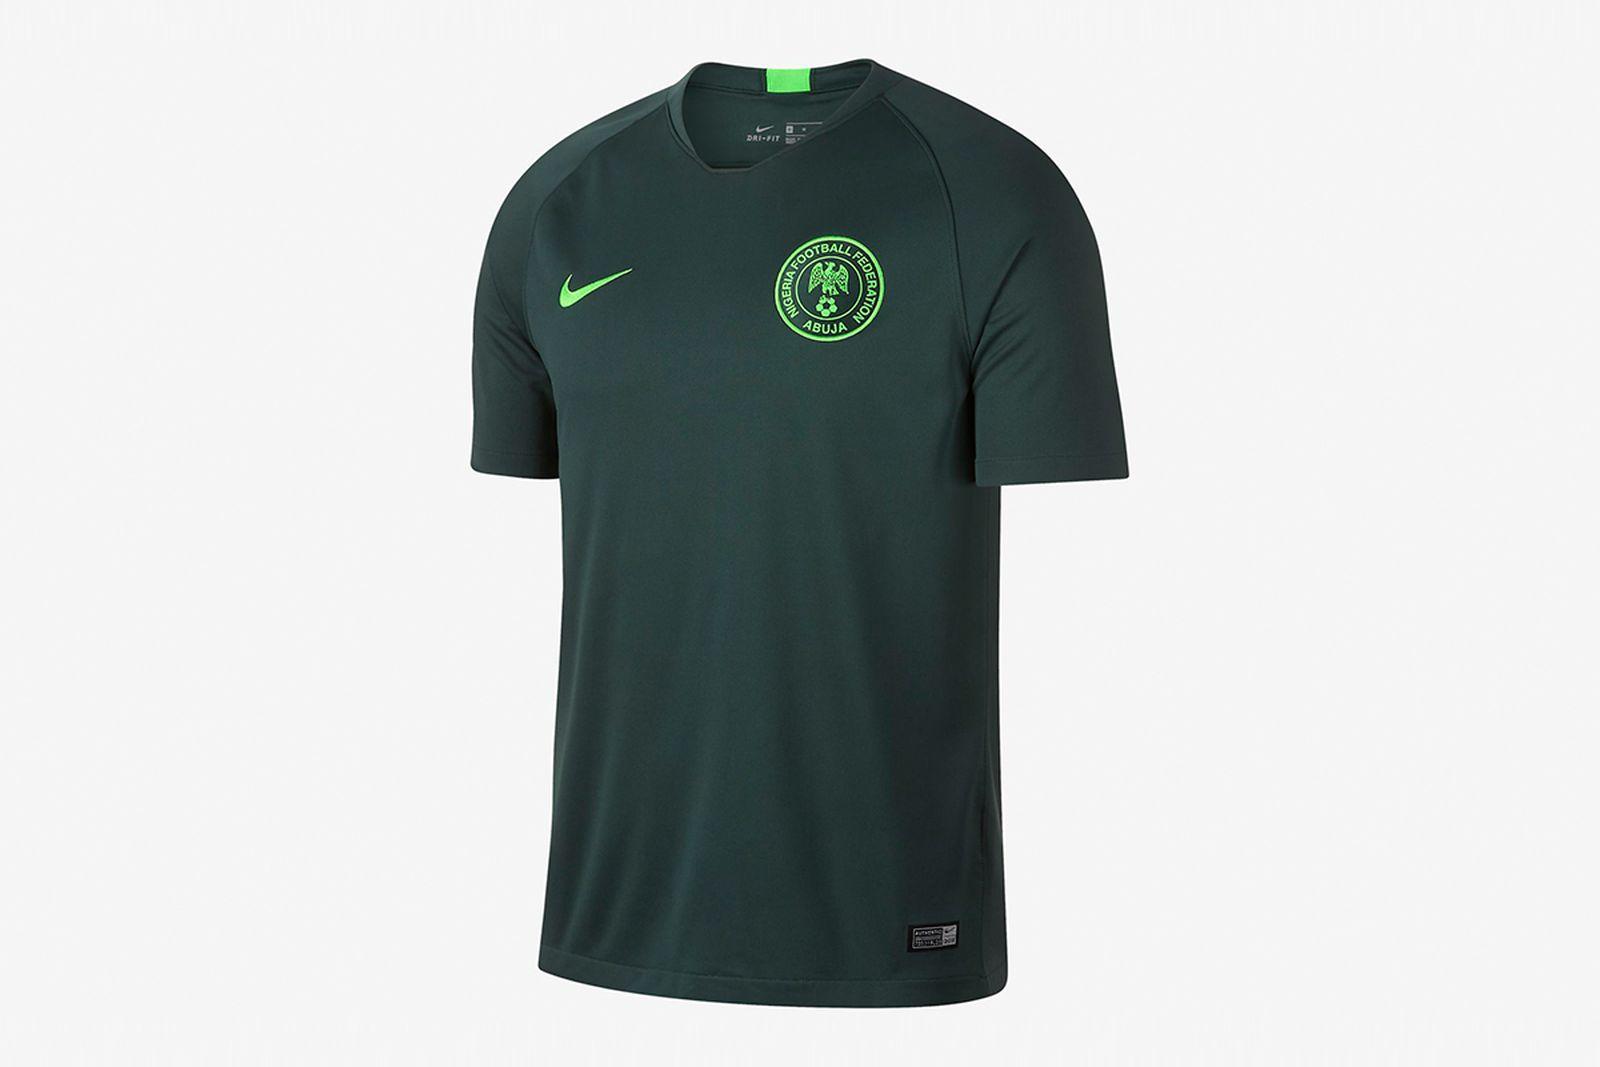 2018 nigeria stadium away jersey 2018 FIFA World Cup nigeria football kit